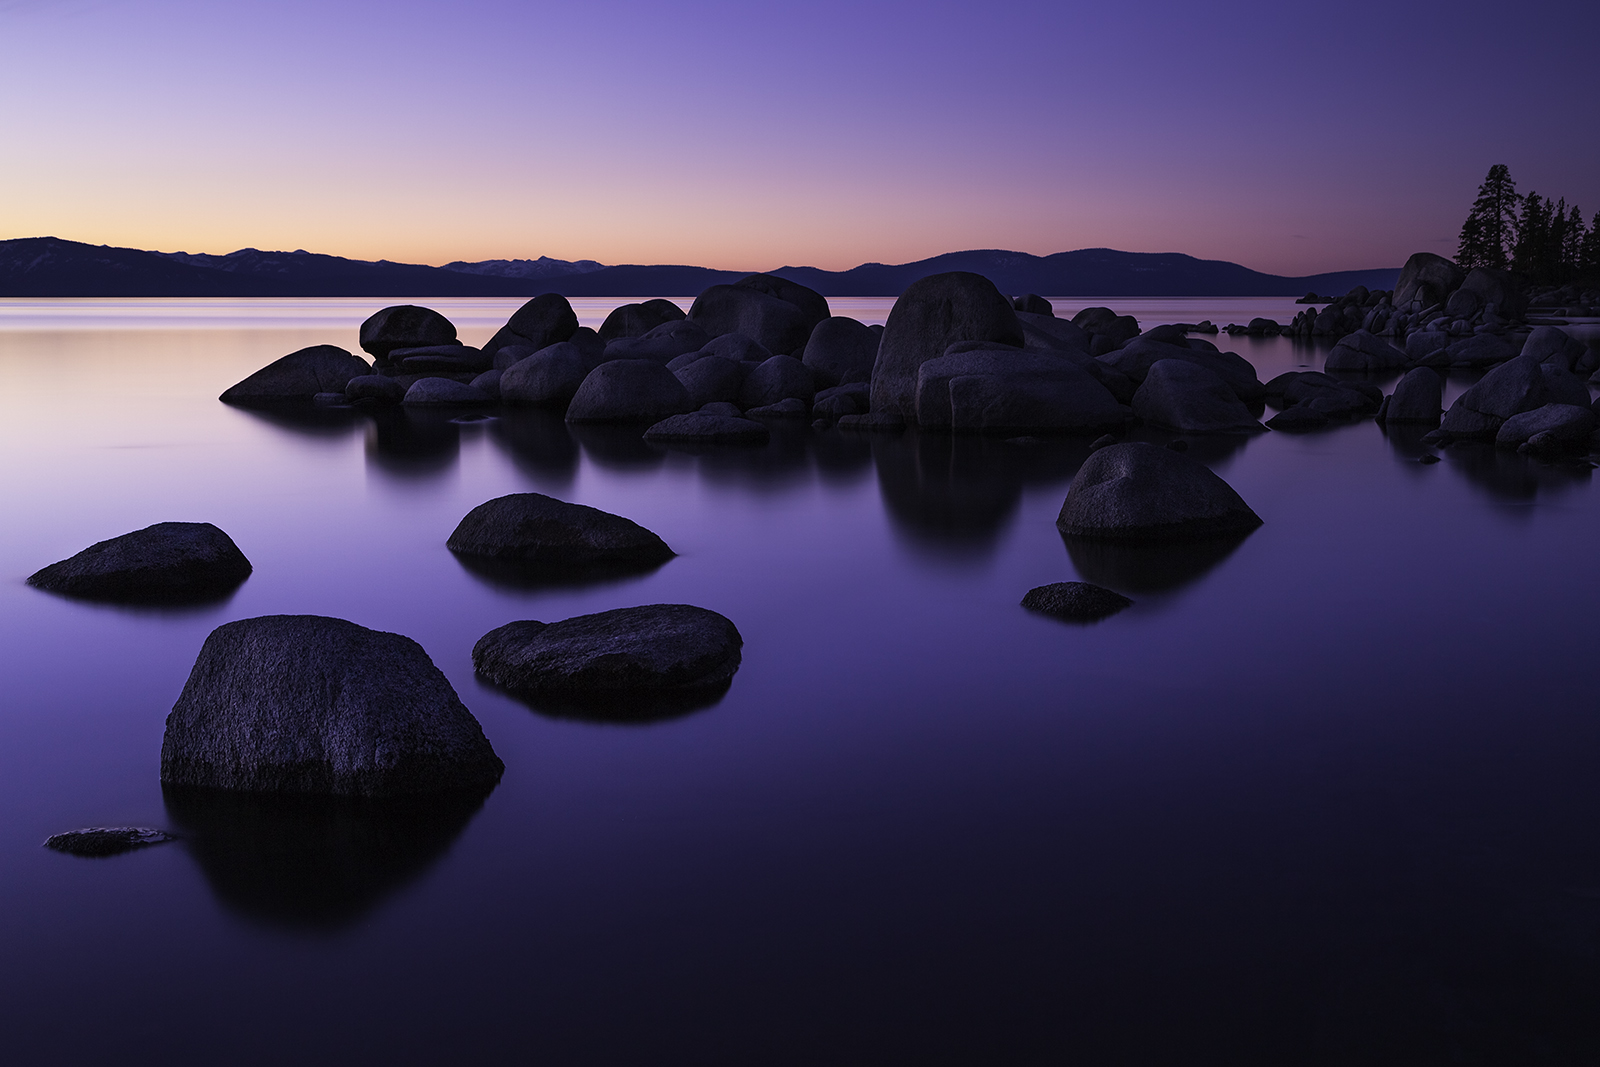 Twilight at Zephyr Cove, Lake Tahoe